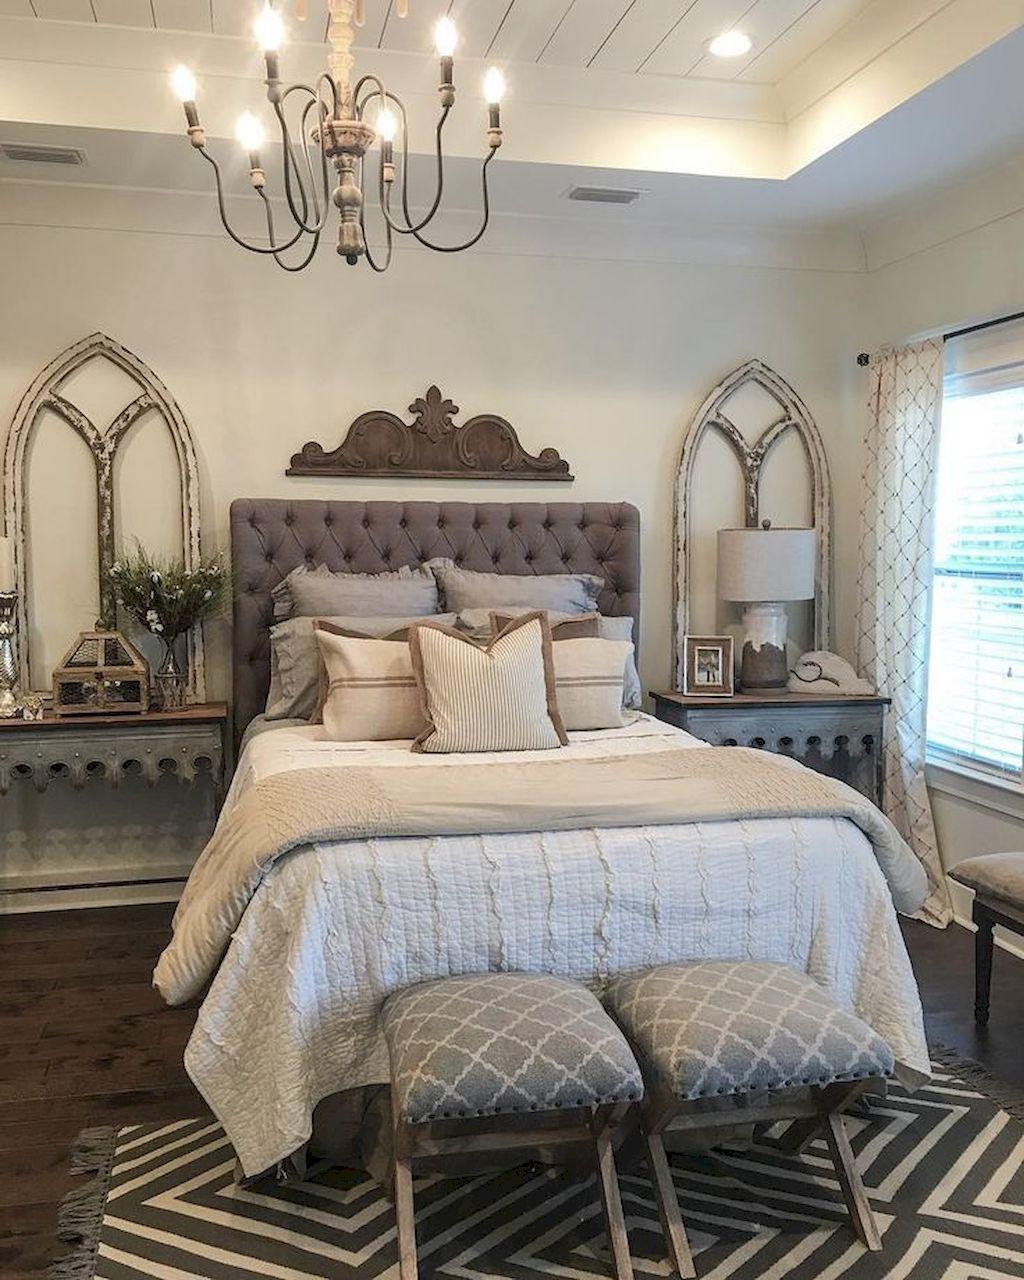 Farmhouse Bedroom Decor Ideas Are Very Warmly Country